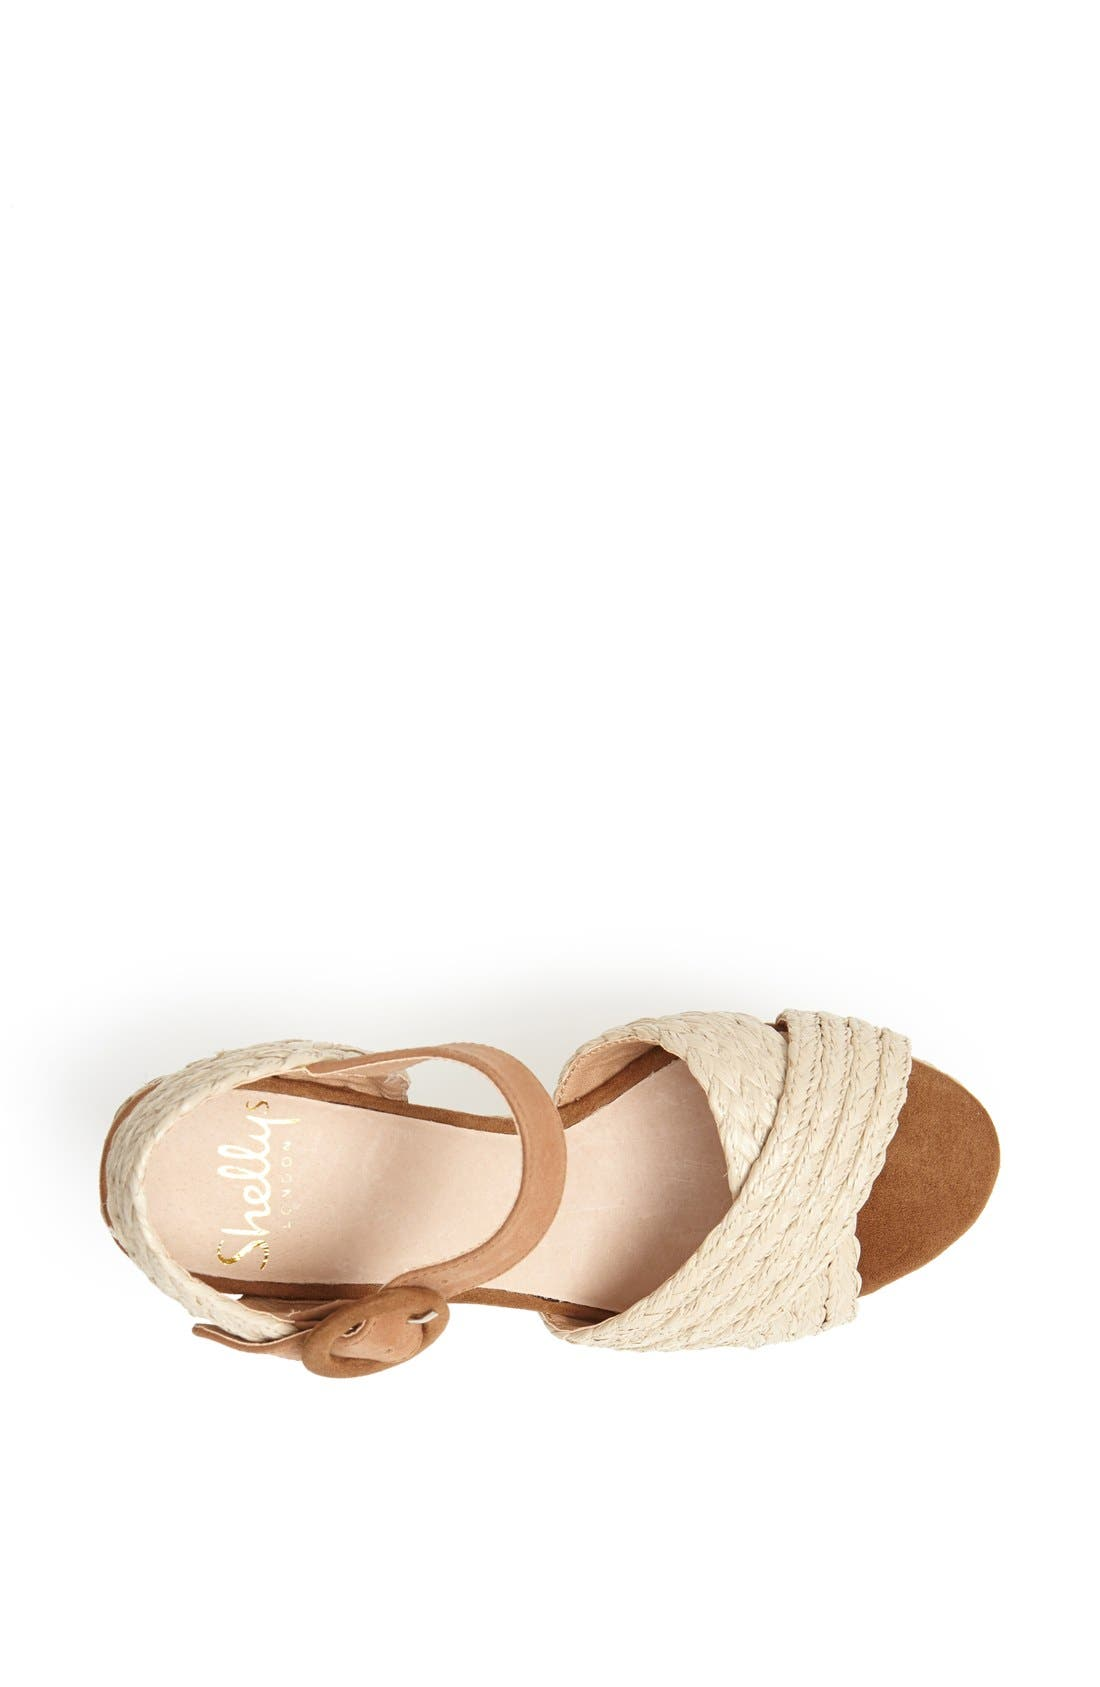 Alternate Image 3  - Shellys London 'Kaawen' Sandal